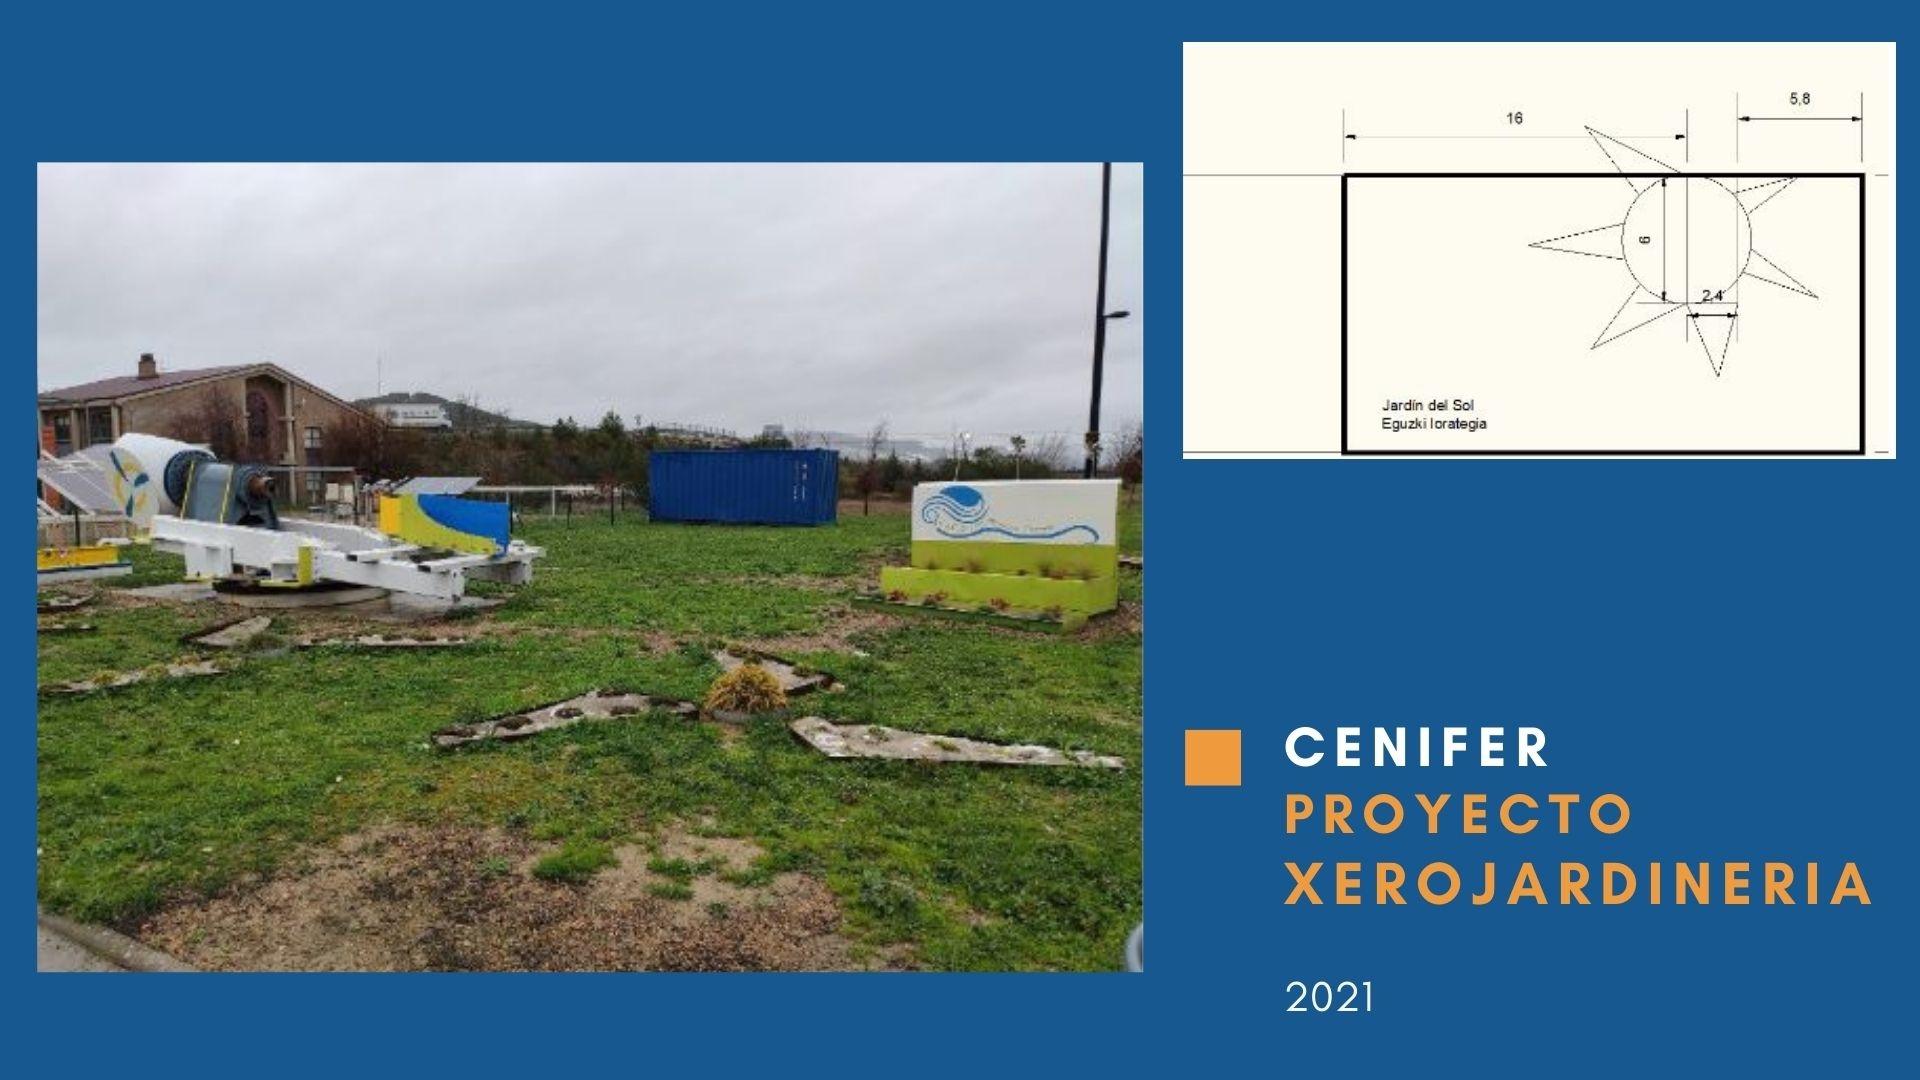 Cenifer - Proyecto Xerojardineria 2021